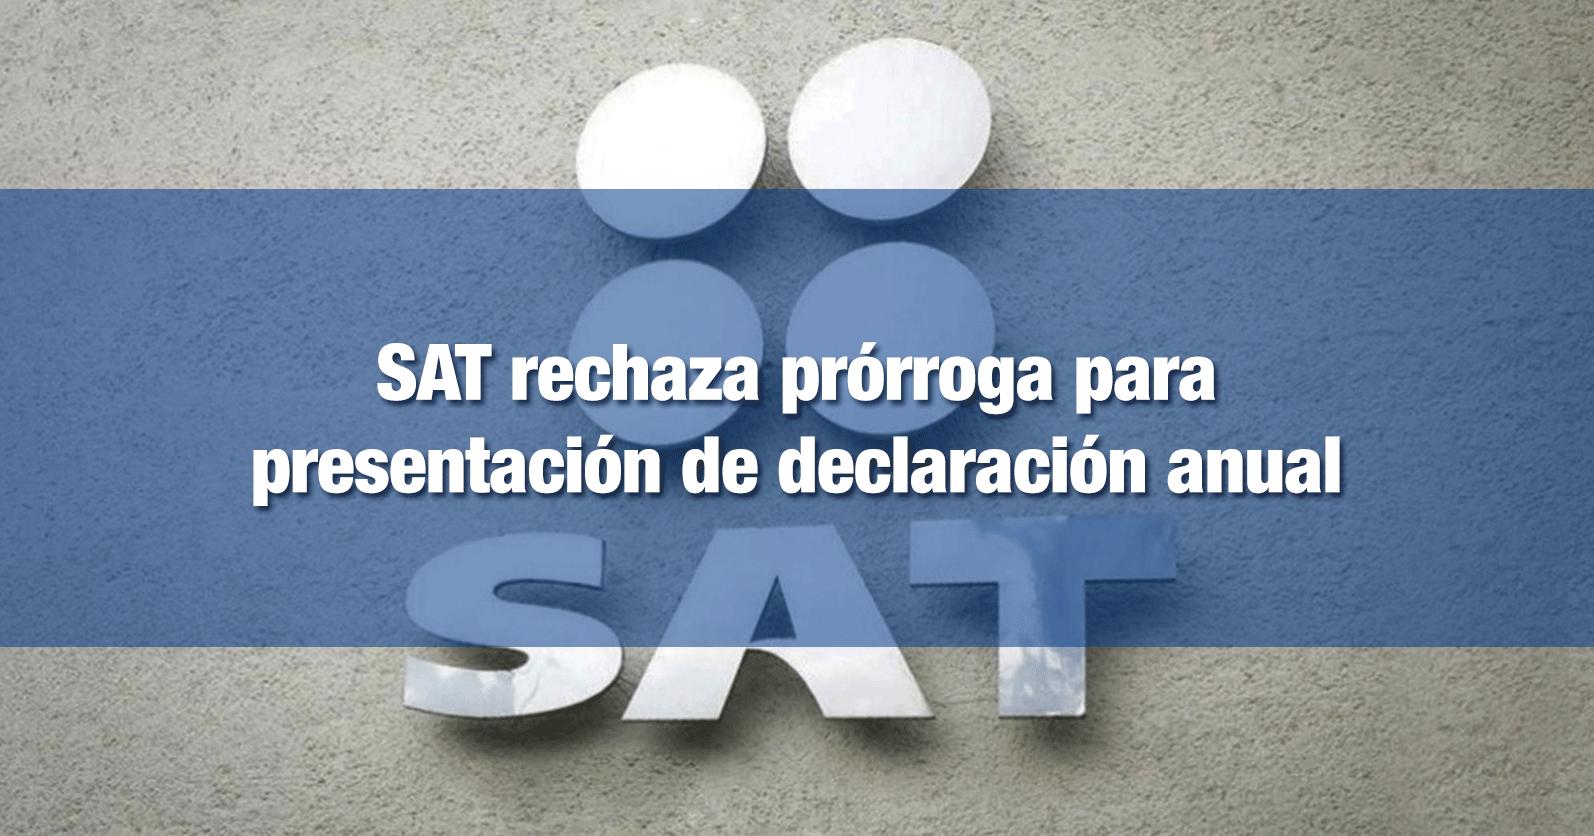 SAT rechaza prórroga para presentación de declaración anual